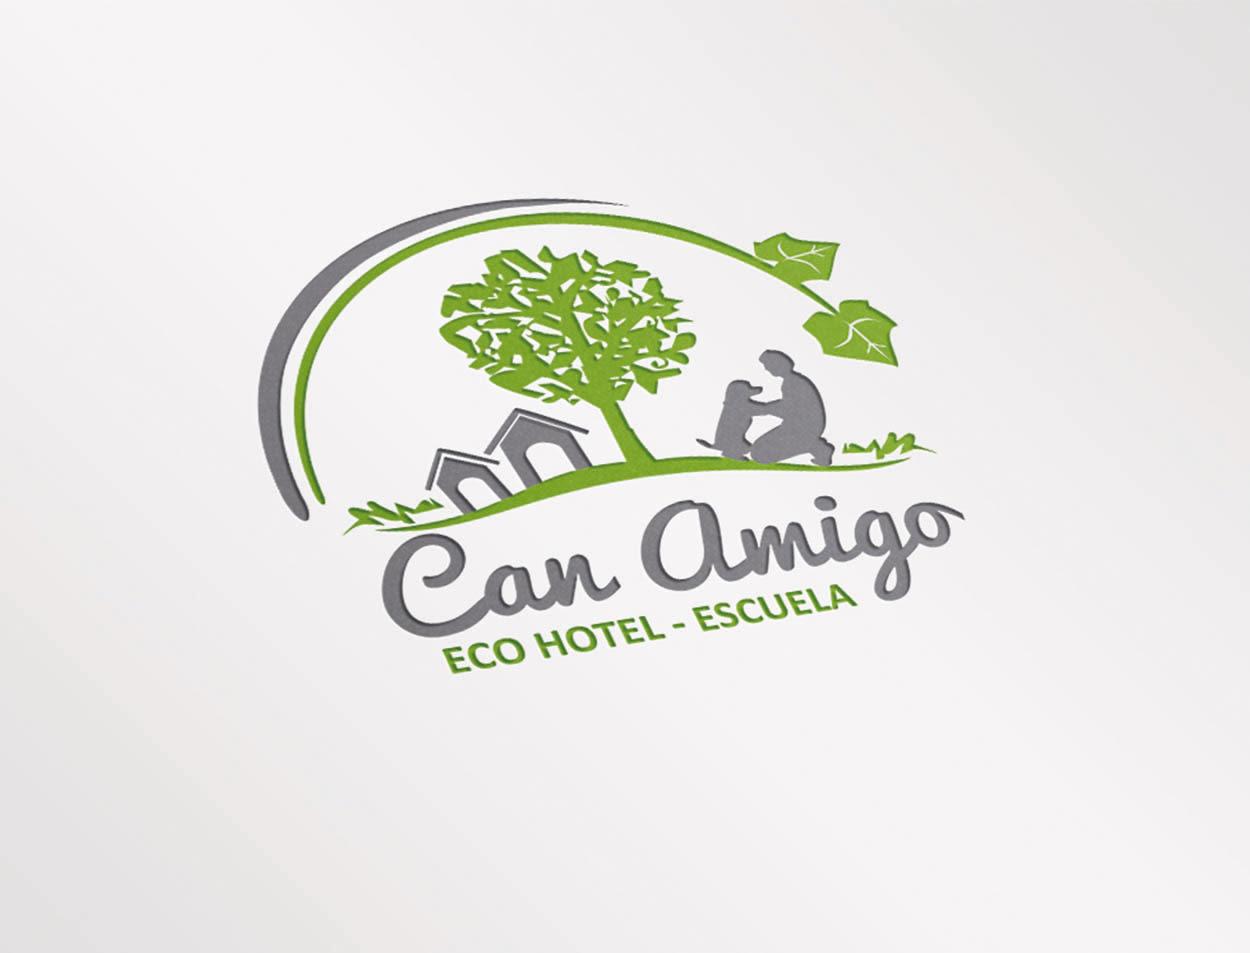 mock up canamigo